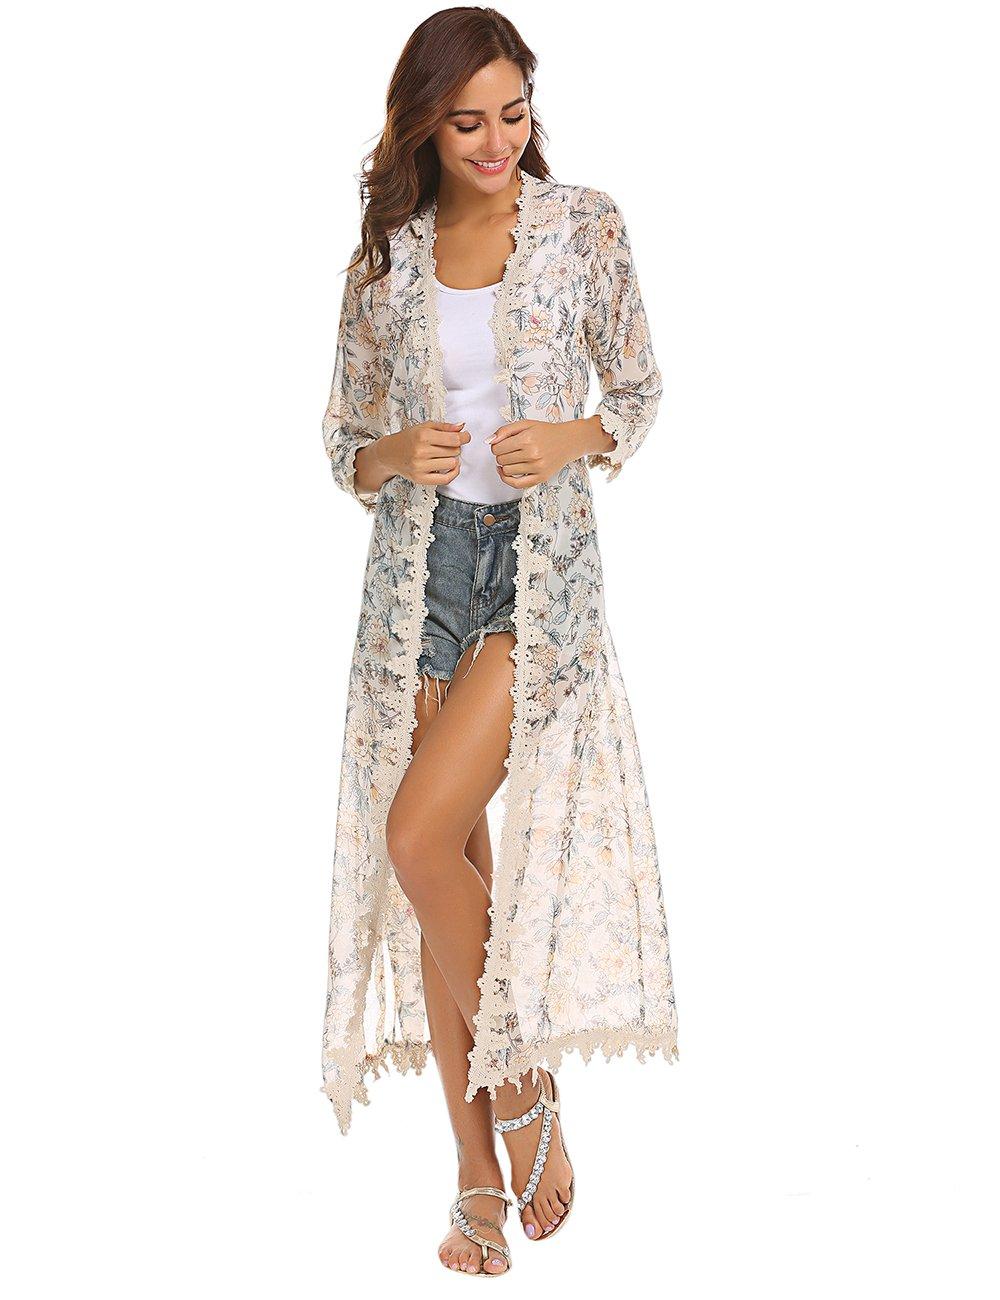 LuckyMore Women's 3/4 Sleeve Long Chiffon Swimsuit Bathing Suit Beach Bikini Swimwear Cover up Kimono Cardigan Beige S